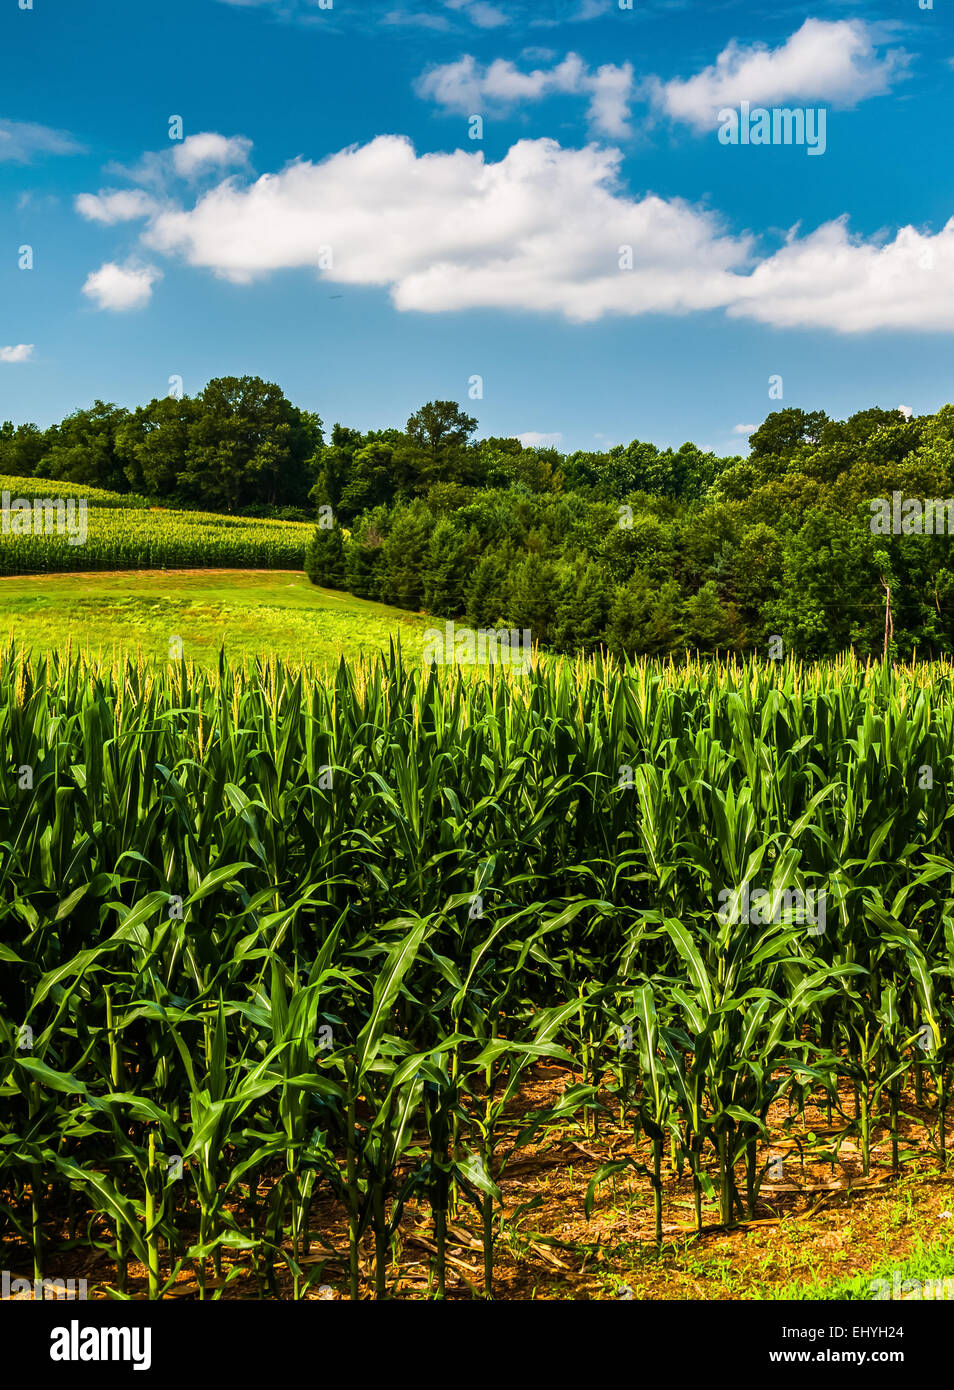 Maisfeld und Rollings Hügel im südlichen York County, Pennsylvania. Stockbild